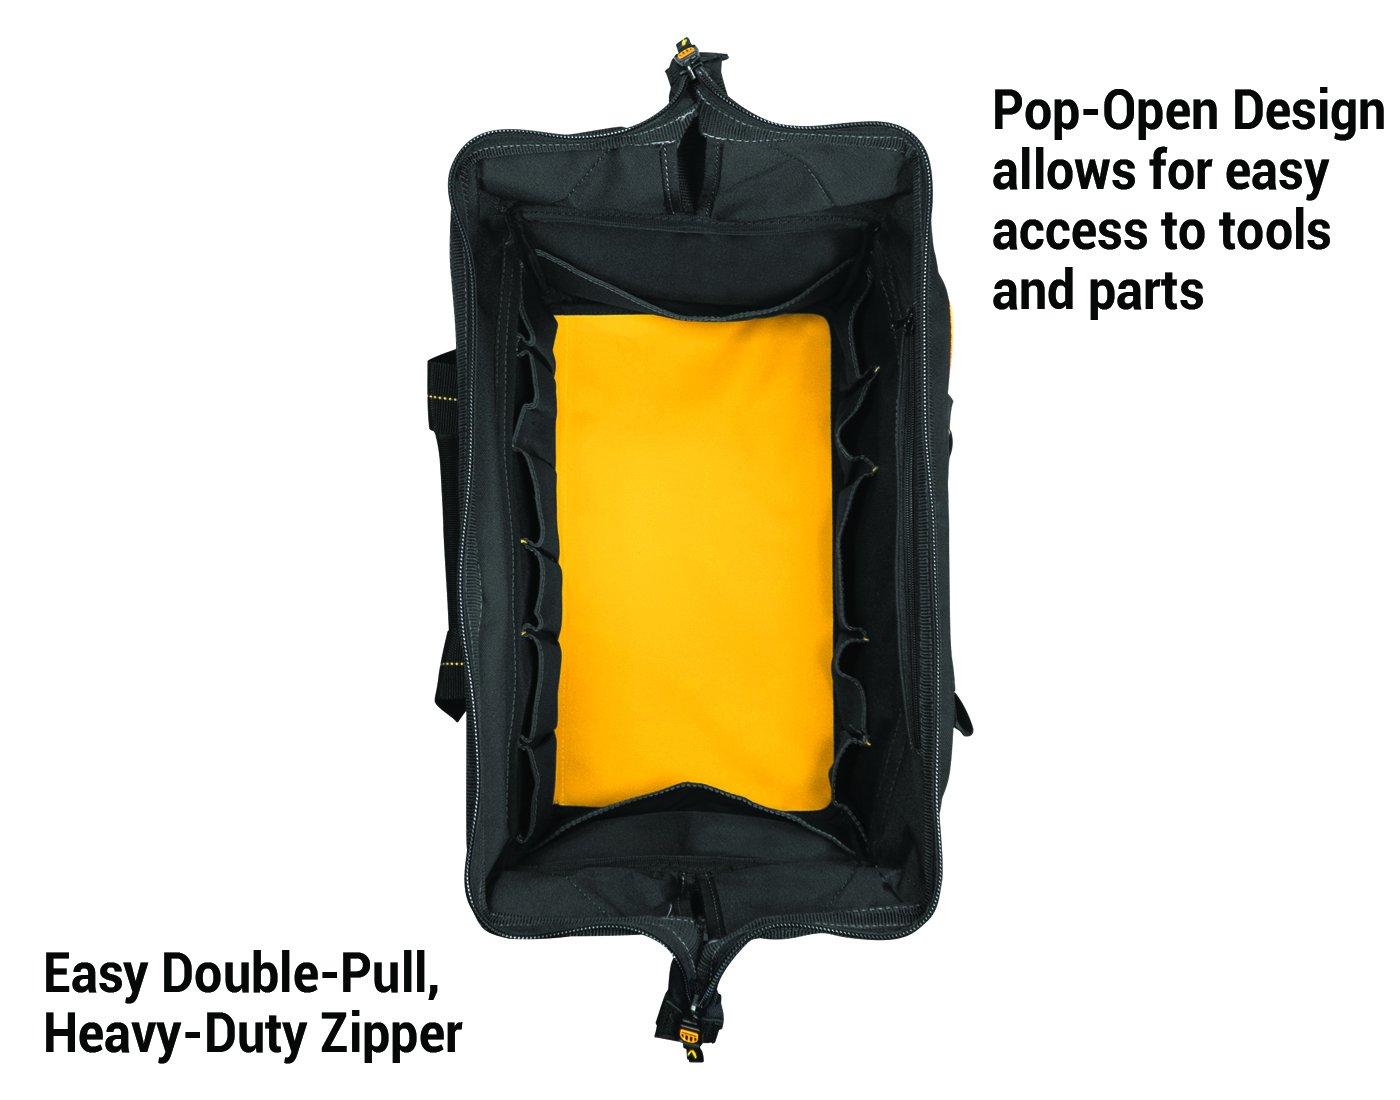 DEWALT DG5553 40 Pocket 18 Inch Pro Contractor's Closed Top Tool Bag by DEWALT (Image #1)